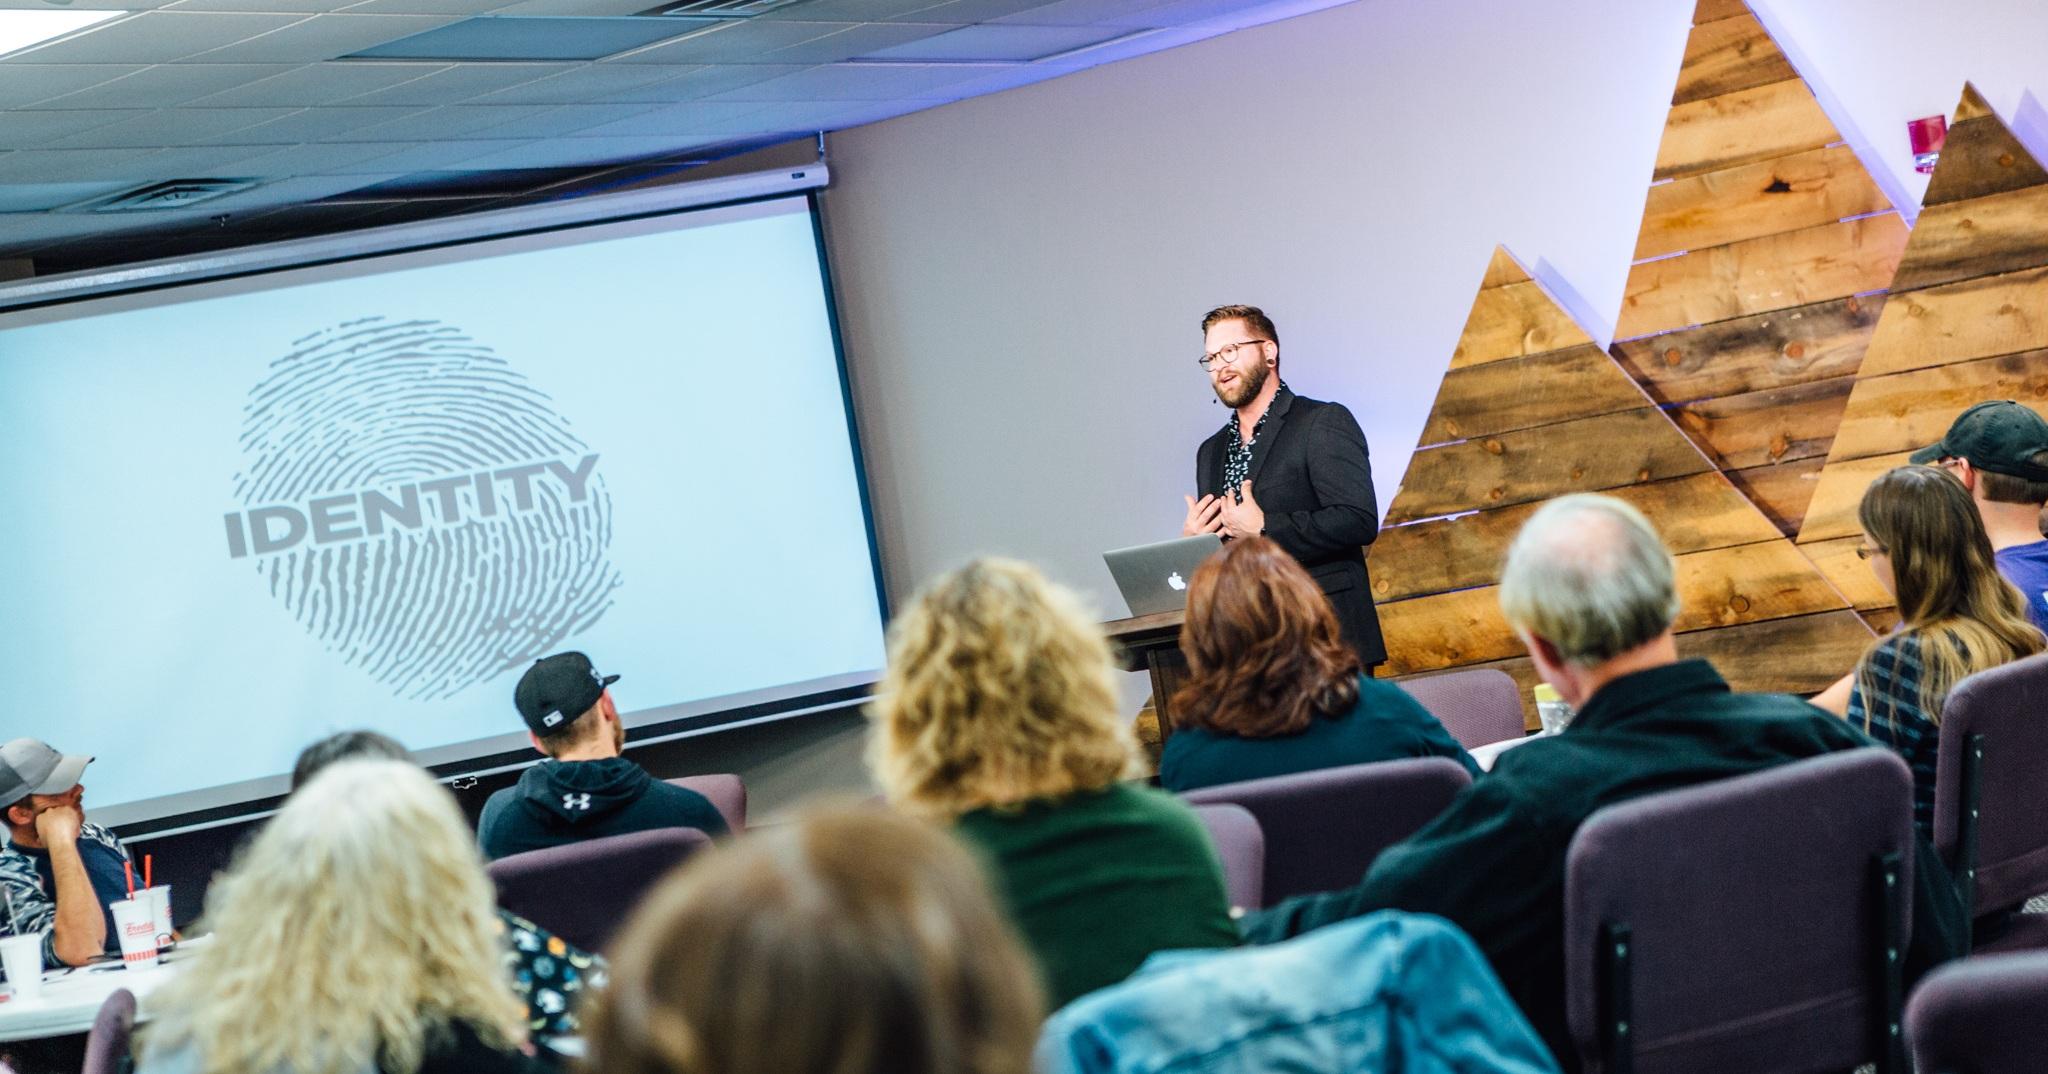 Fellowship+Church+Grand+Junction+Colorado+fellowshipgj+7642.jpg